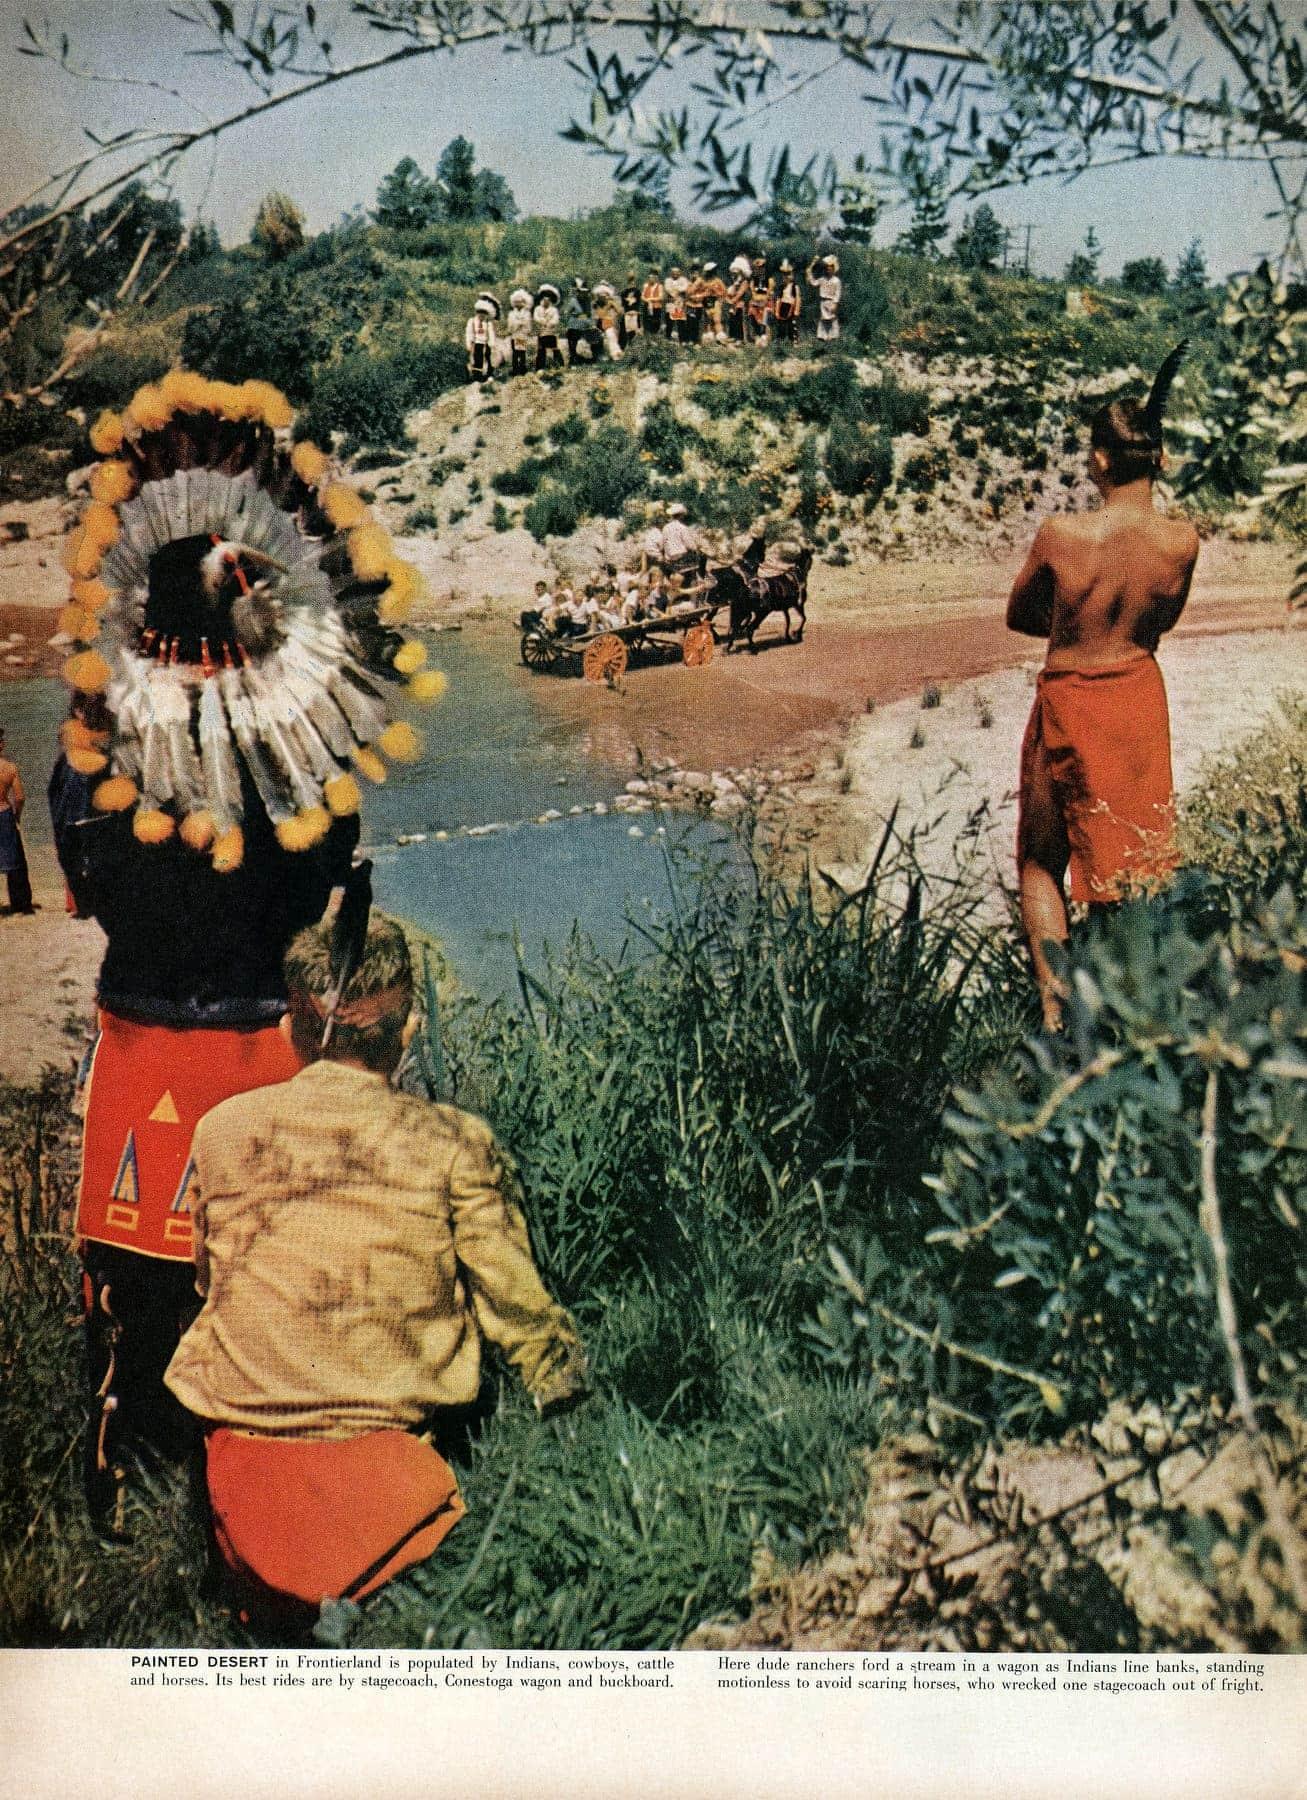 Disneyland opens - Walt Disney's magical new theme park in Southern California 1955 (3)